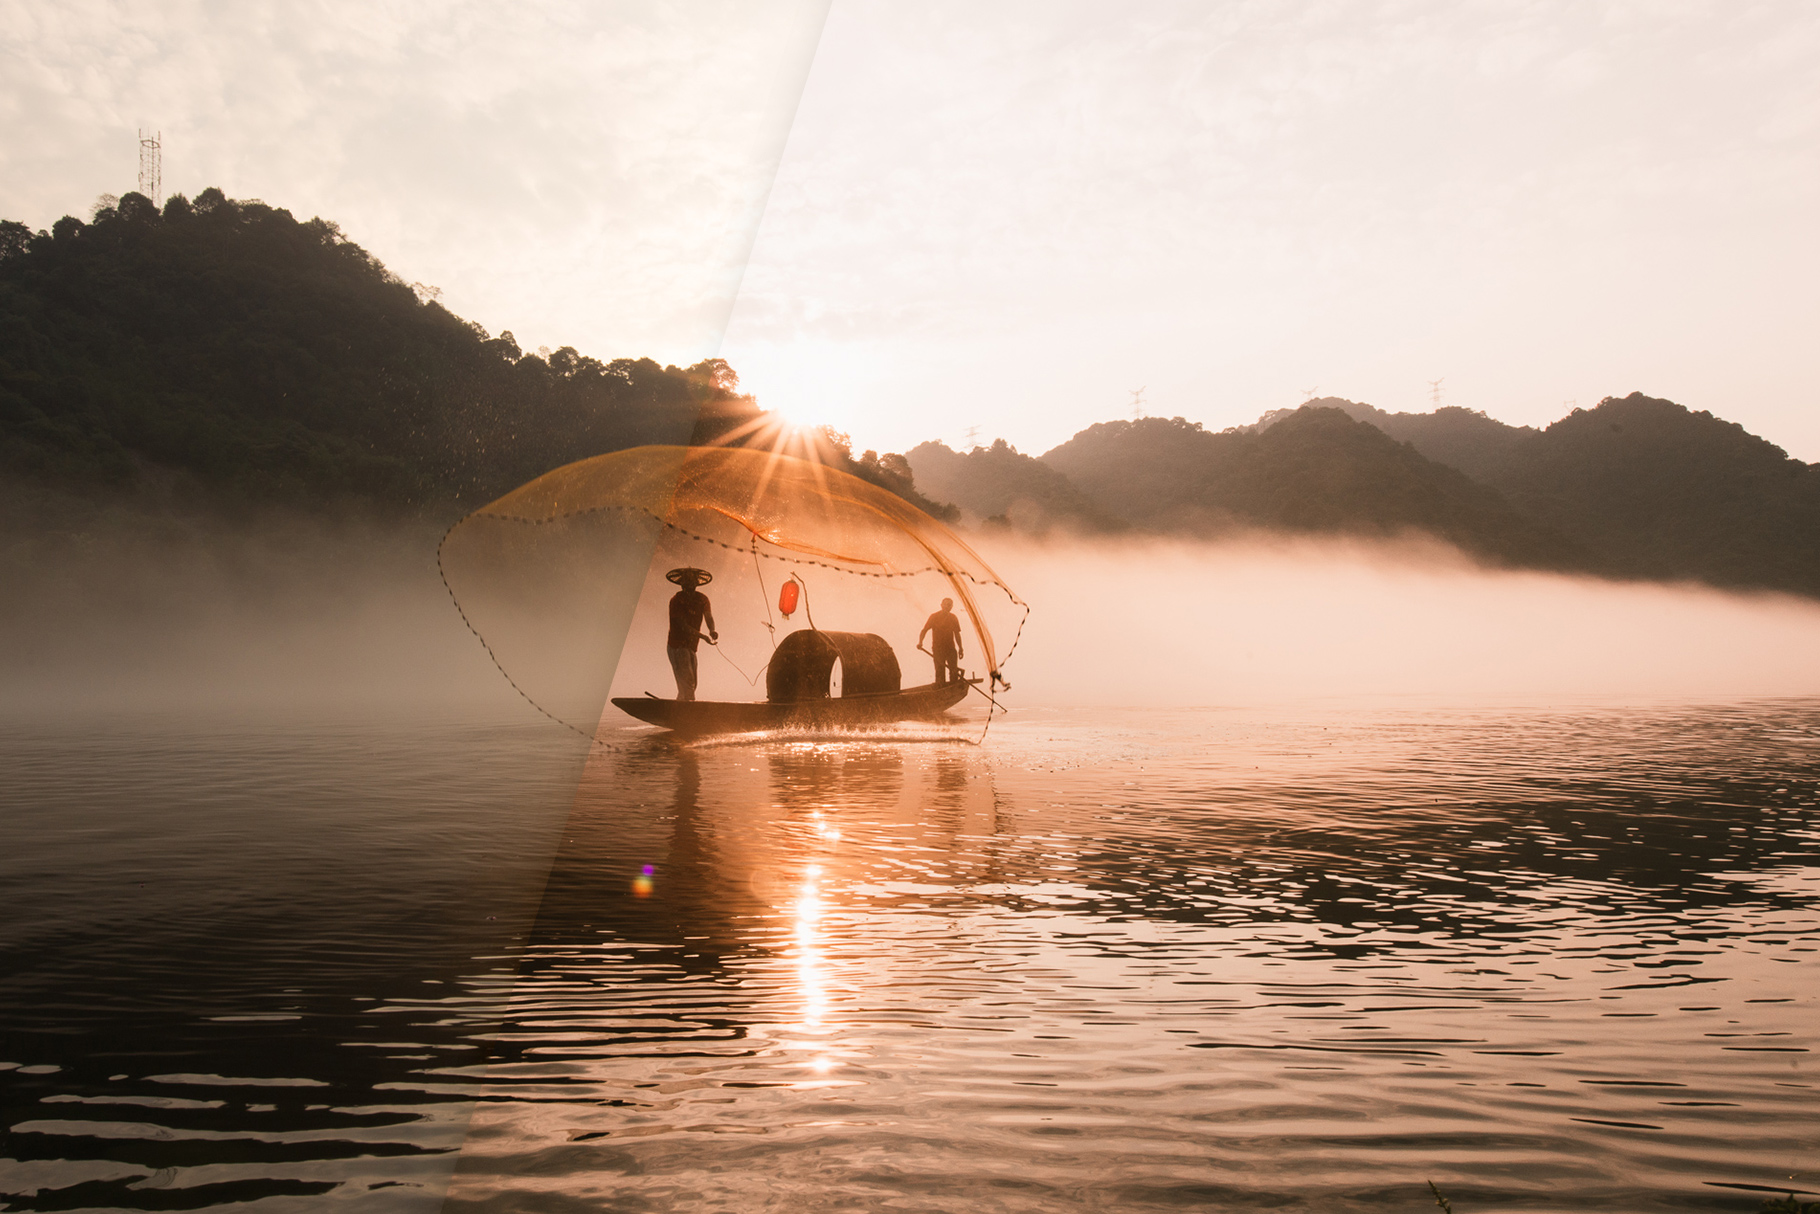 Best Lightroom Presets for Travel & Landscape Photography example image 19